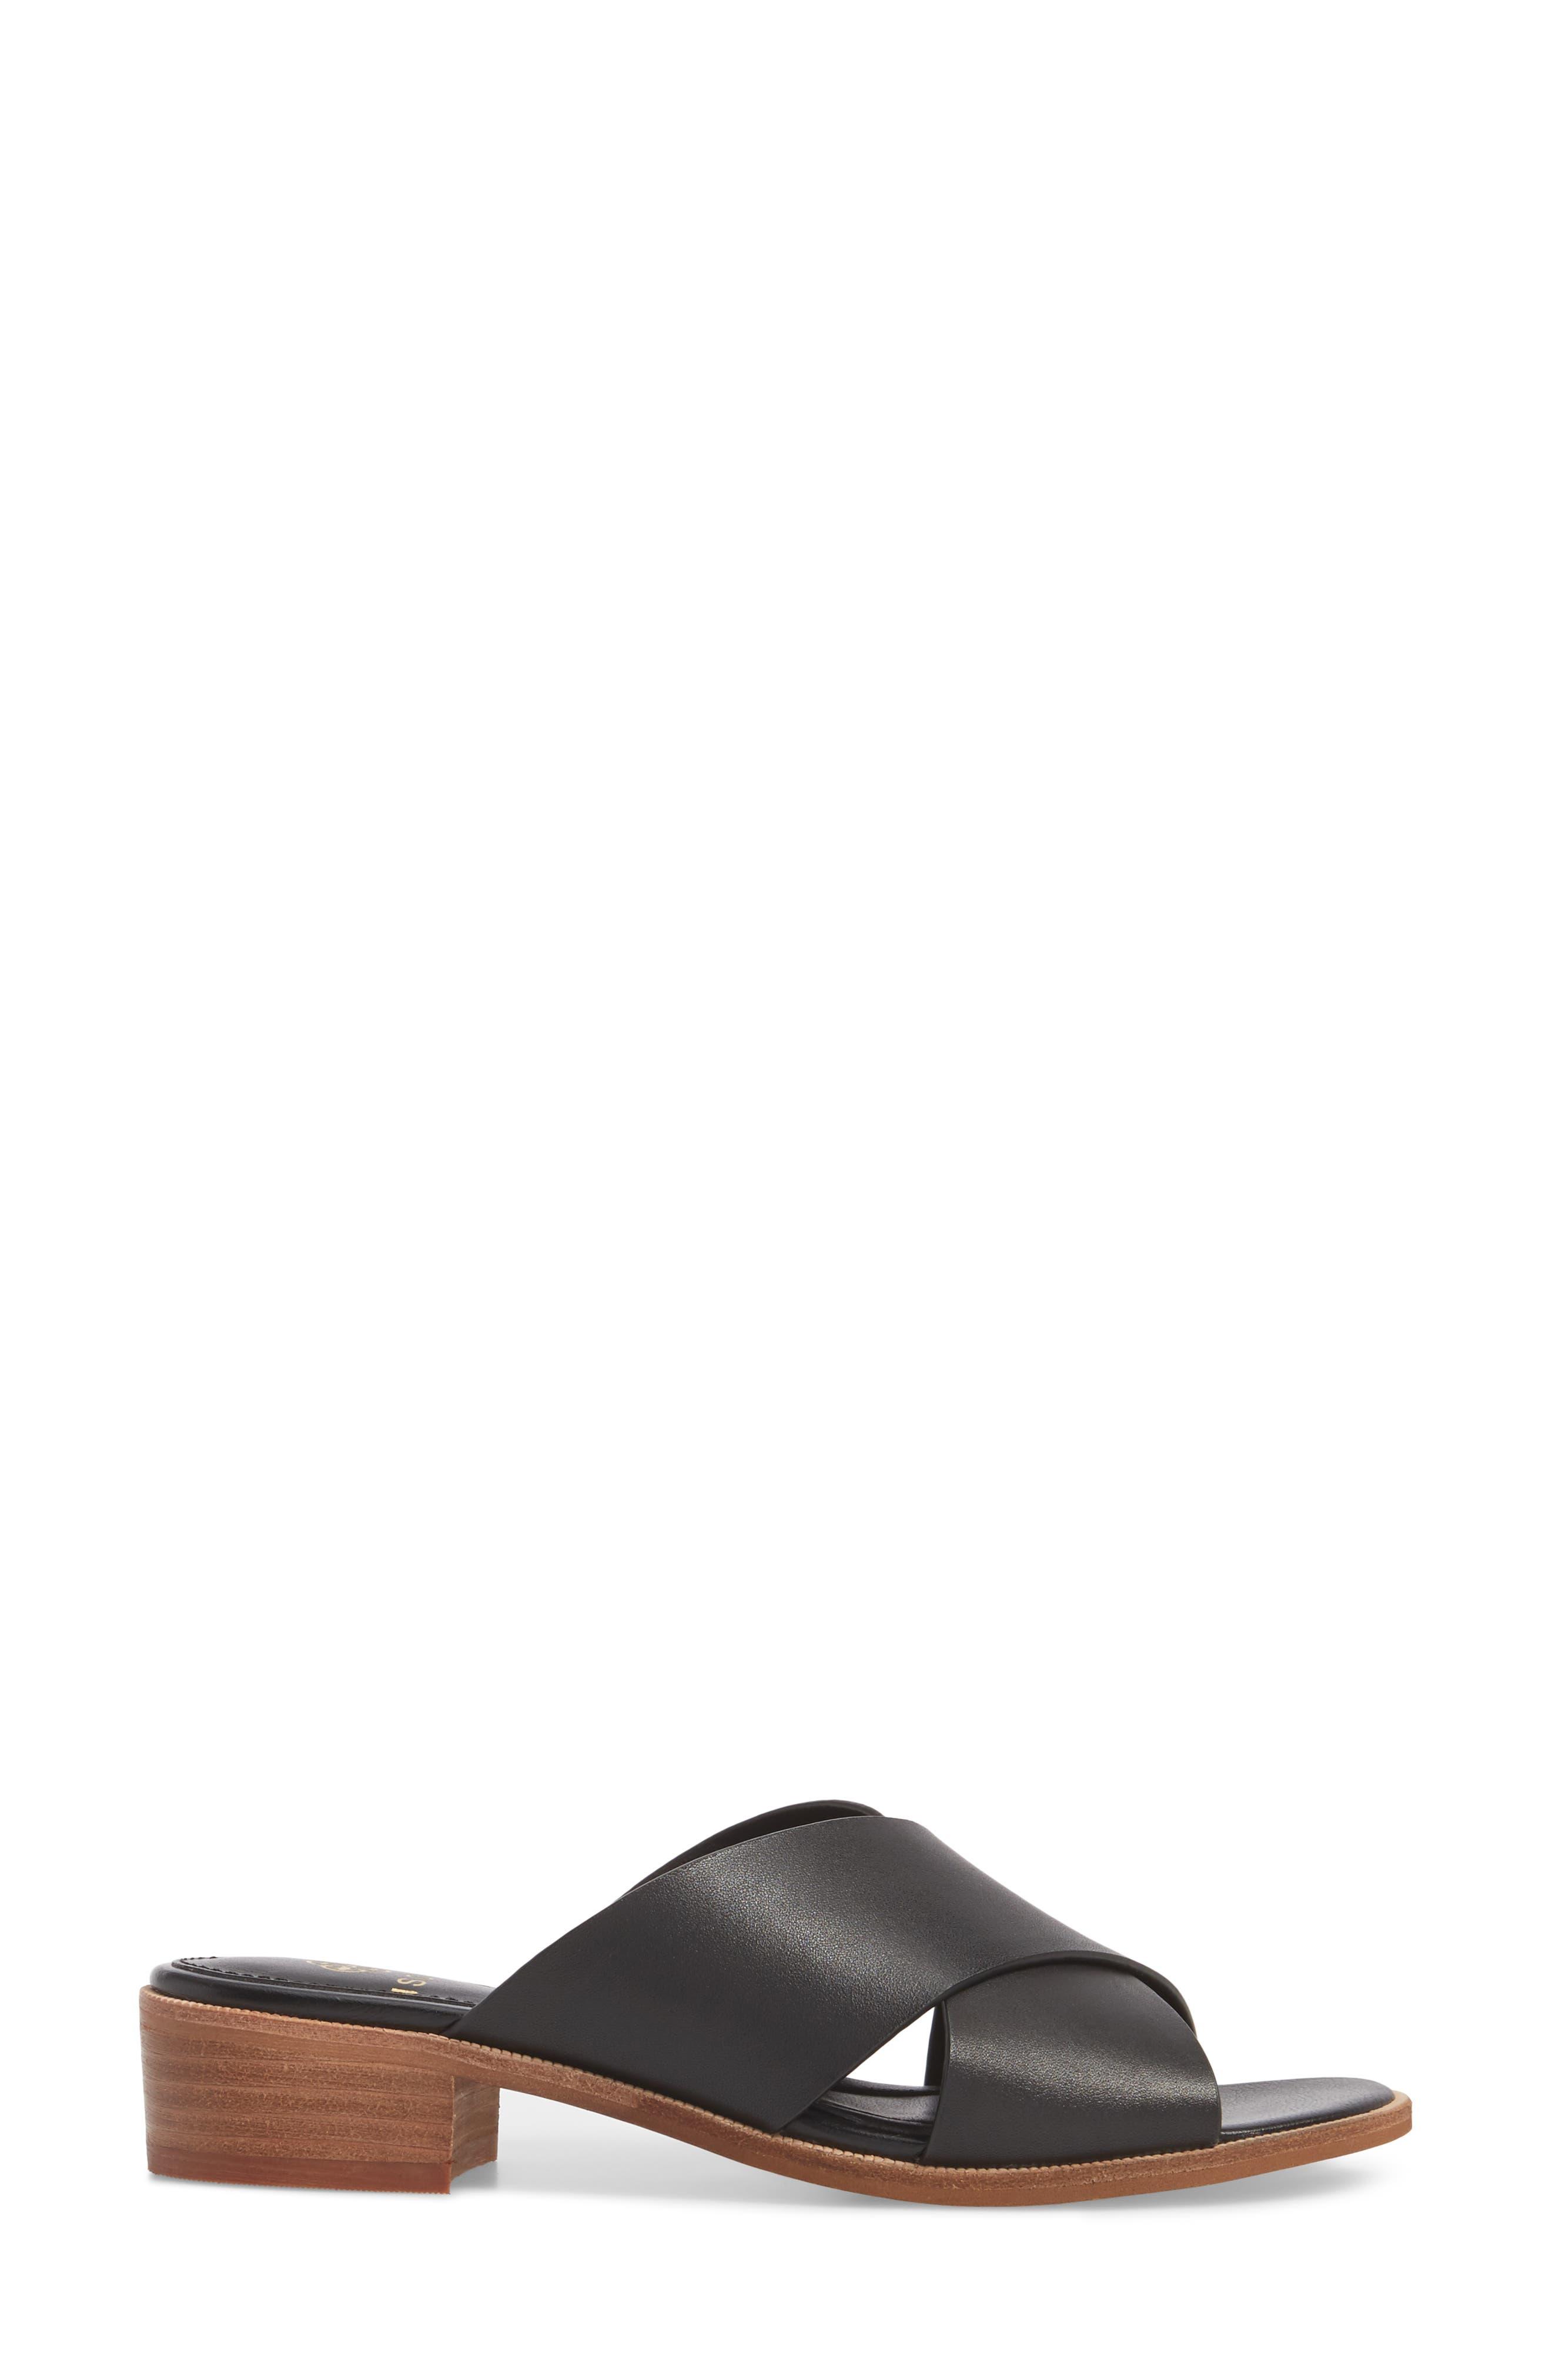 Isola Ginata Slide Sandal,                             Alternate thumbnail 3, color,                             BLACK LEATHER